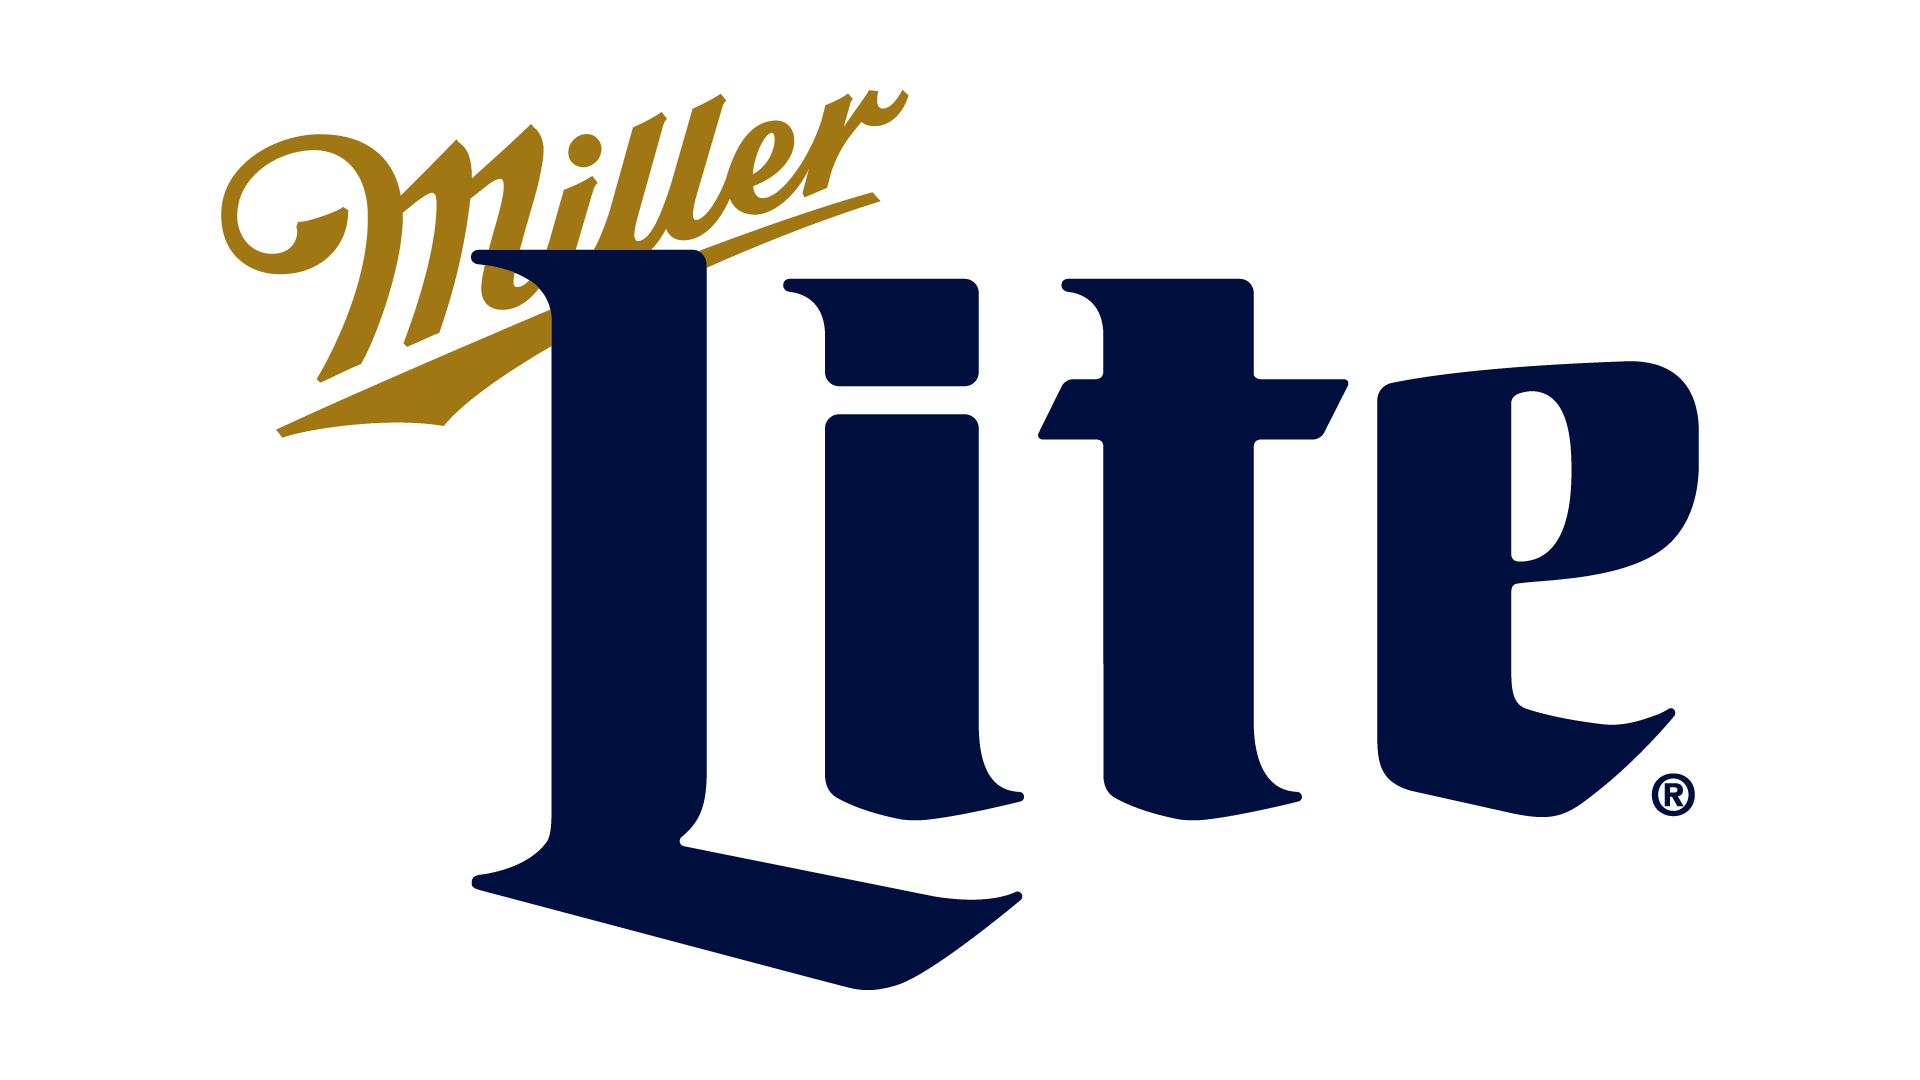 Honda Indy Toronto - Miller Lite Named